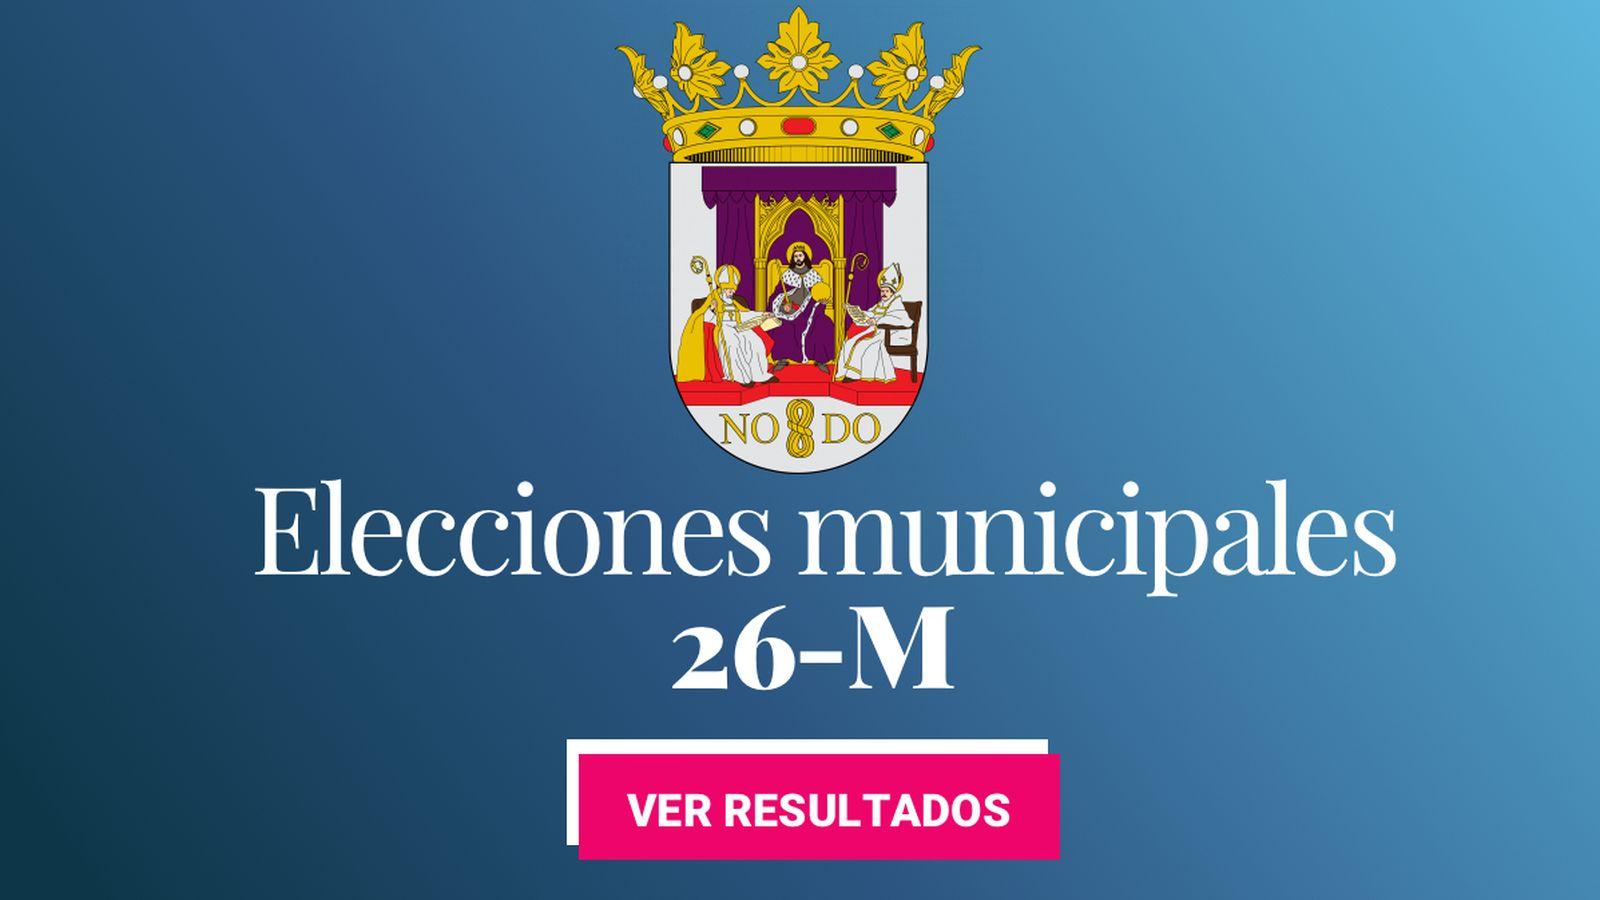 Foto: Elecciones municipales 2019 en Sevilla. (C.C./EC)